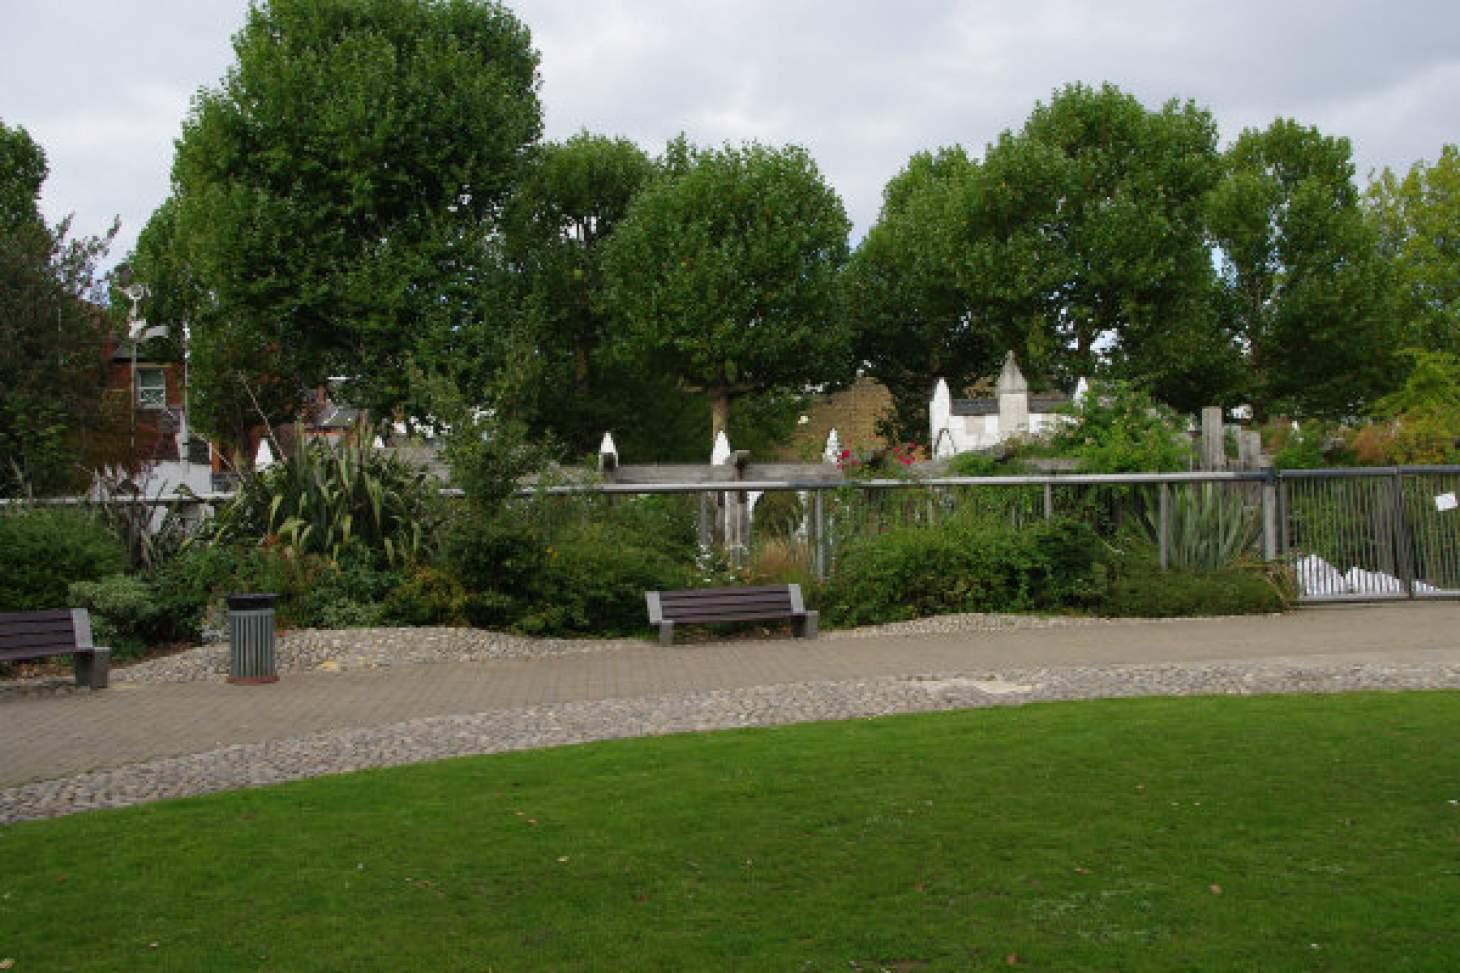 Emslie Horniman's Pleasance Outdoor | Hard (macadam) tennis court